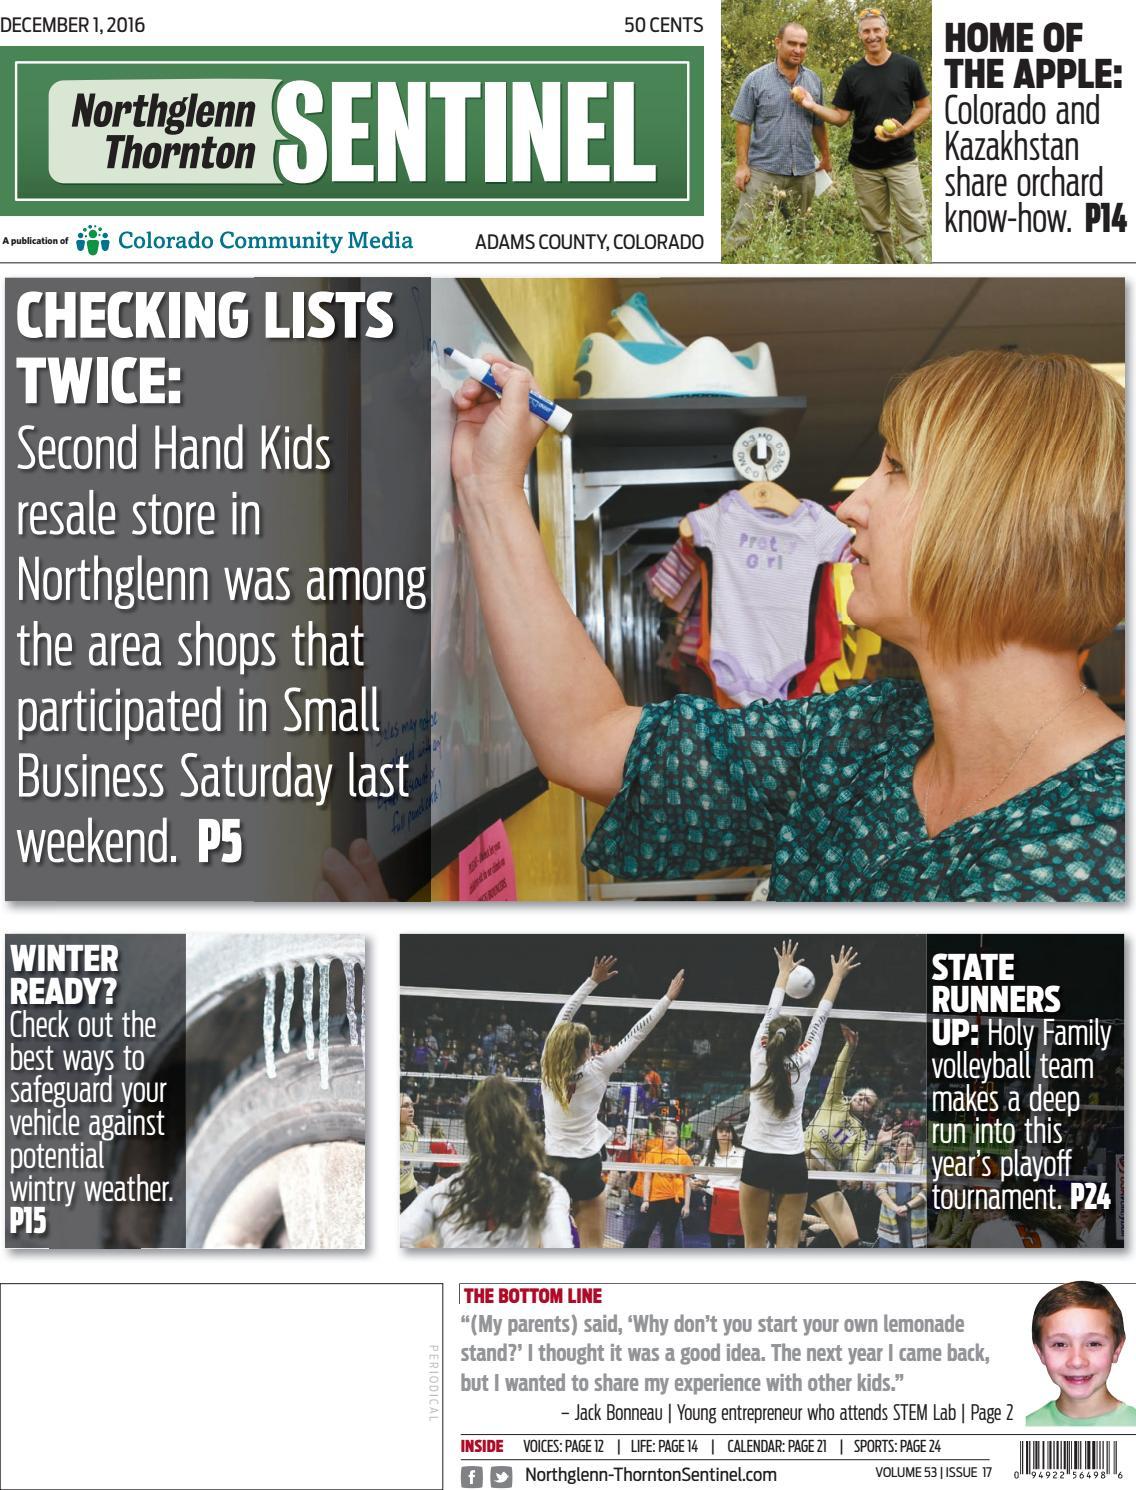 northglenn thornton sentinel 1201 by colorado community media issuu